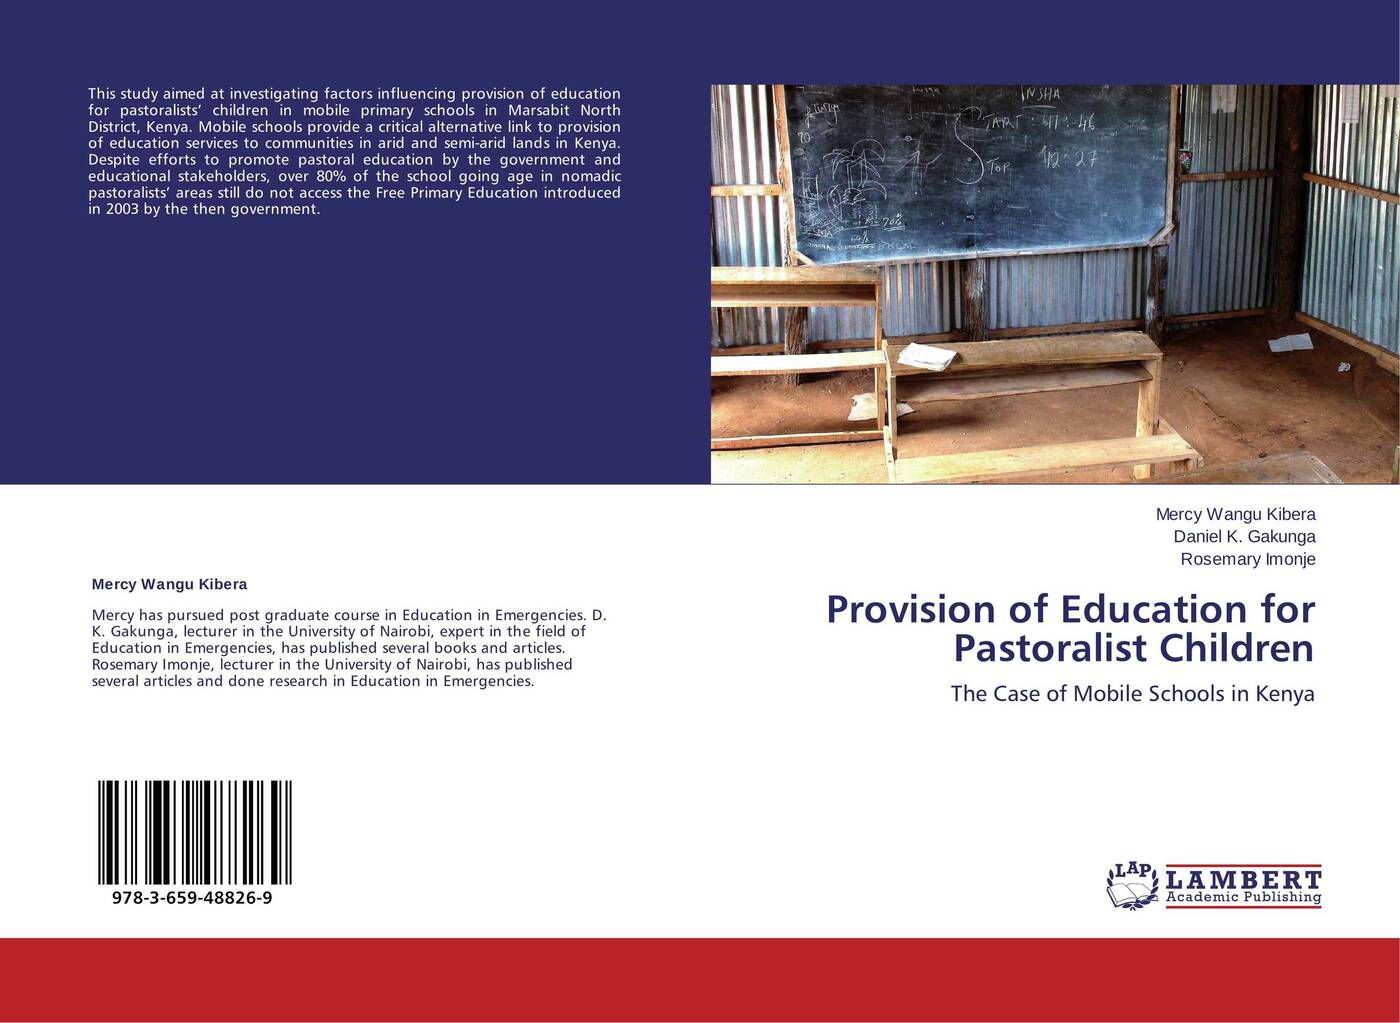 Mercy Wangu Kibera,Daniel K. Gakunga and Rosemary Imonje Provision of Education for Pastoralist Children joseph lelan inclusive education in kenya